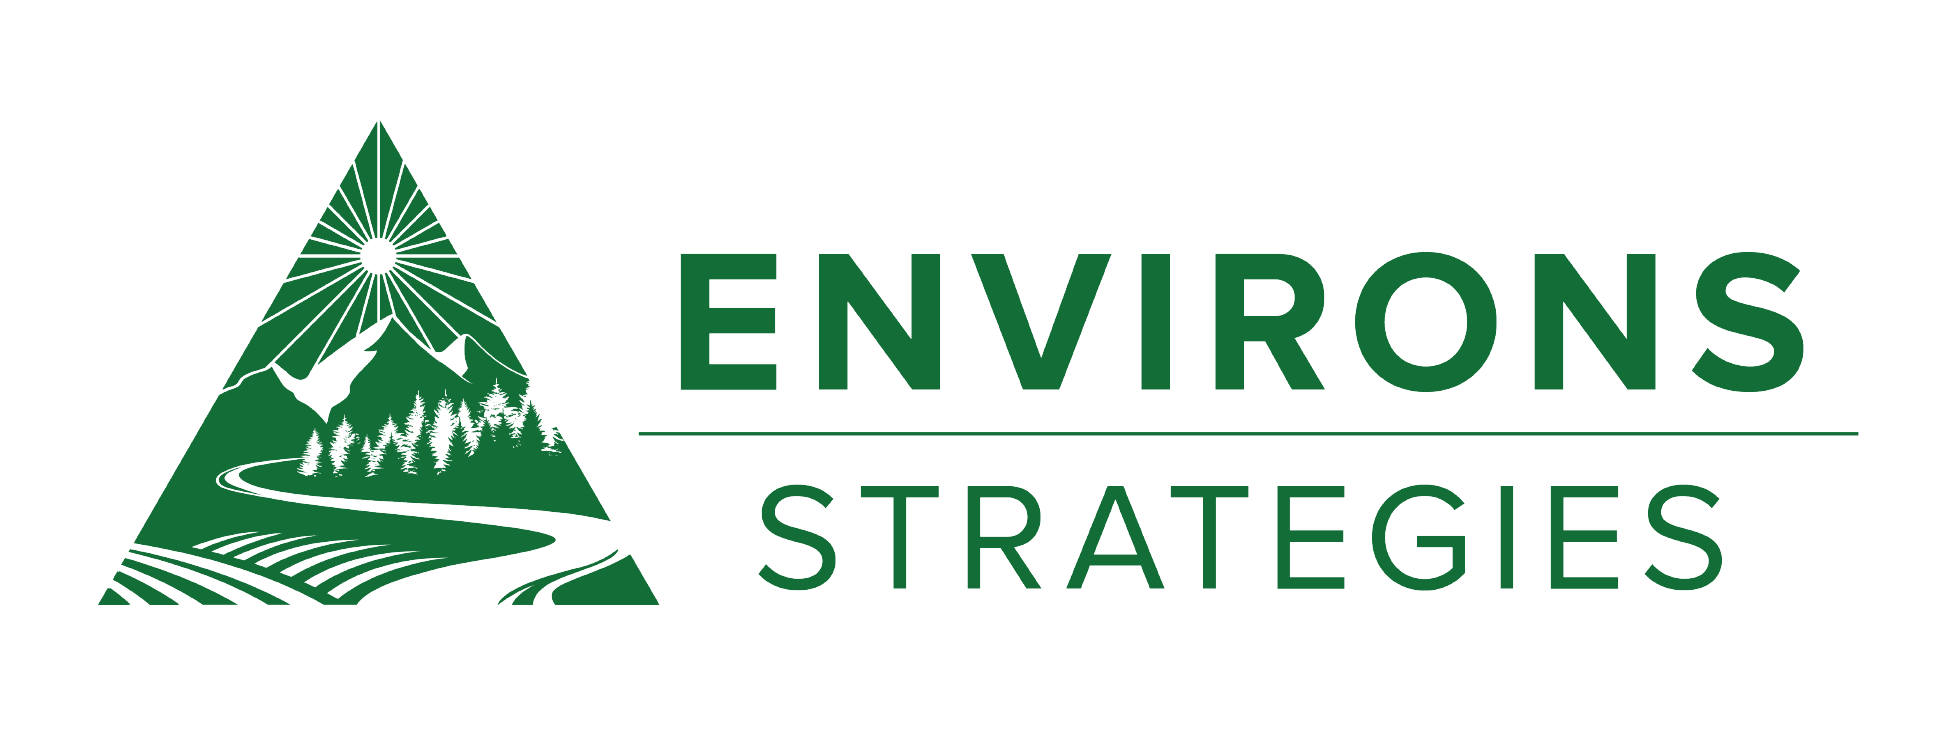 Environs Strategies, LLC